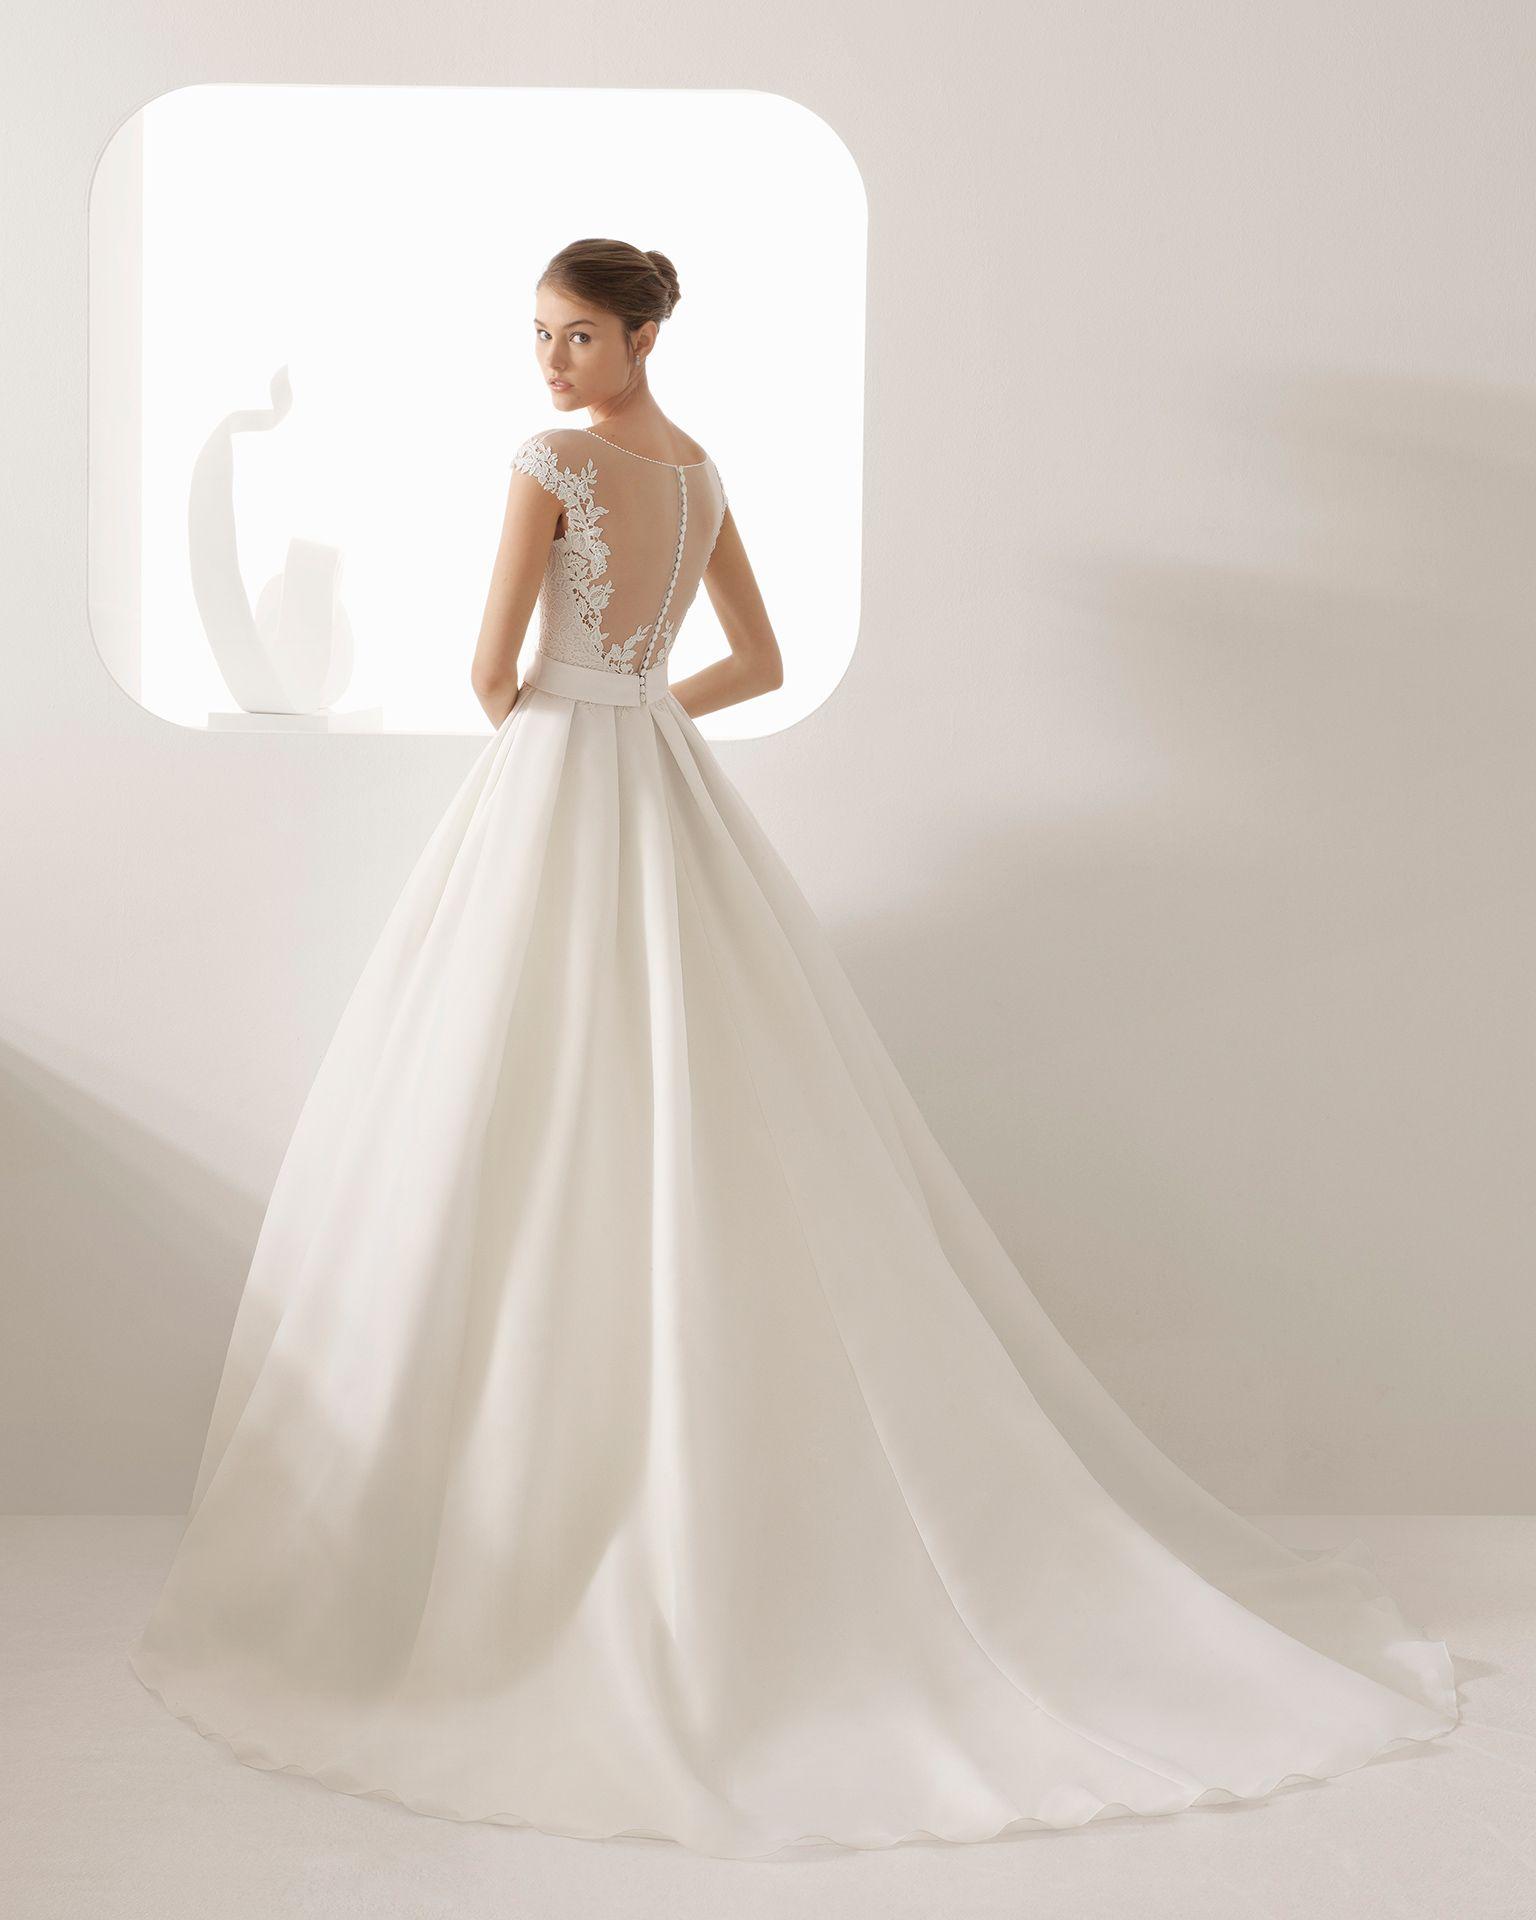 91058f85fb35 ANNE - sposa 2018. Collezione Rosa Clará in 2019